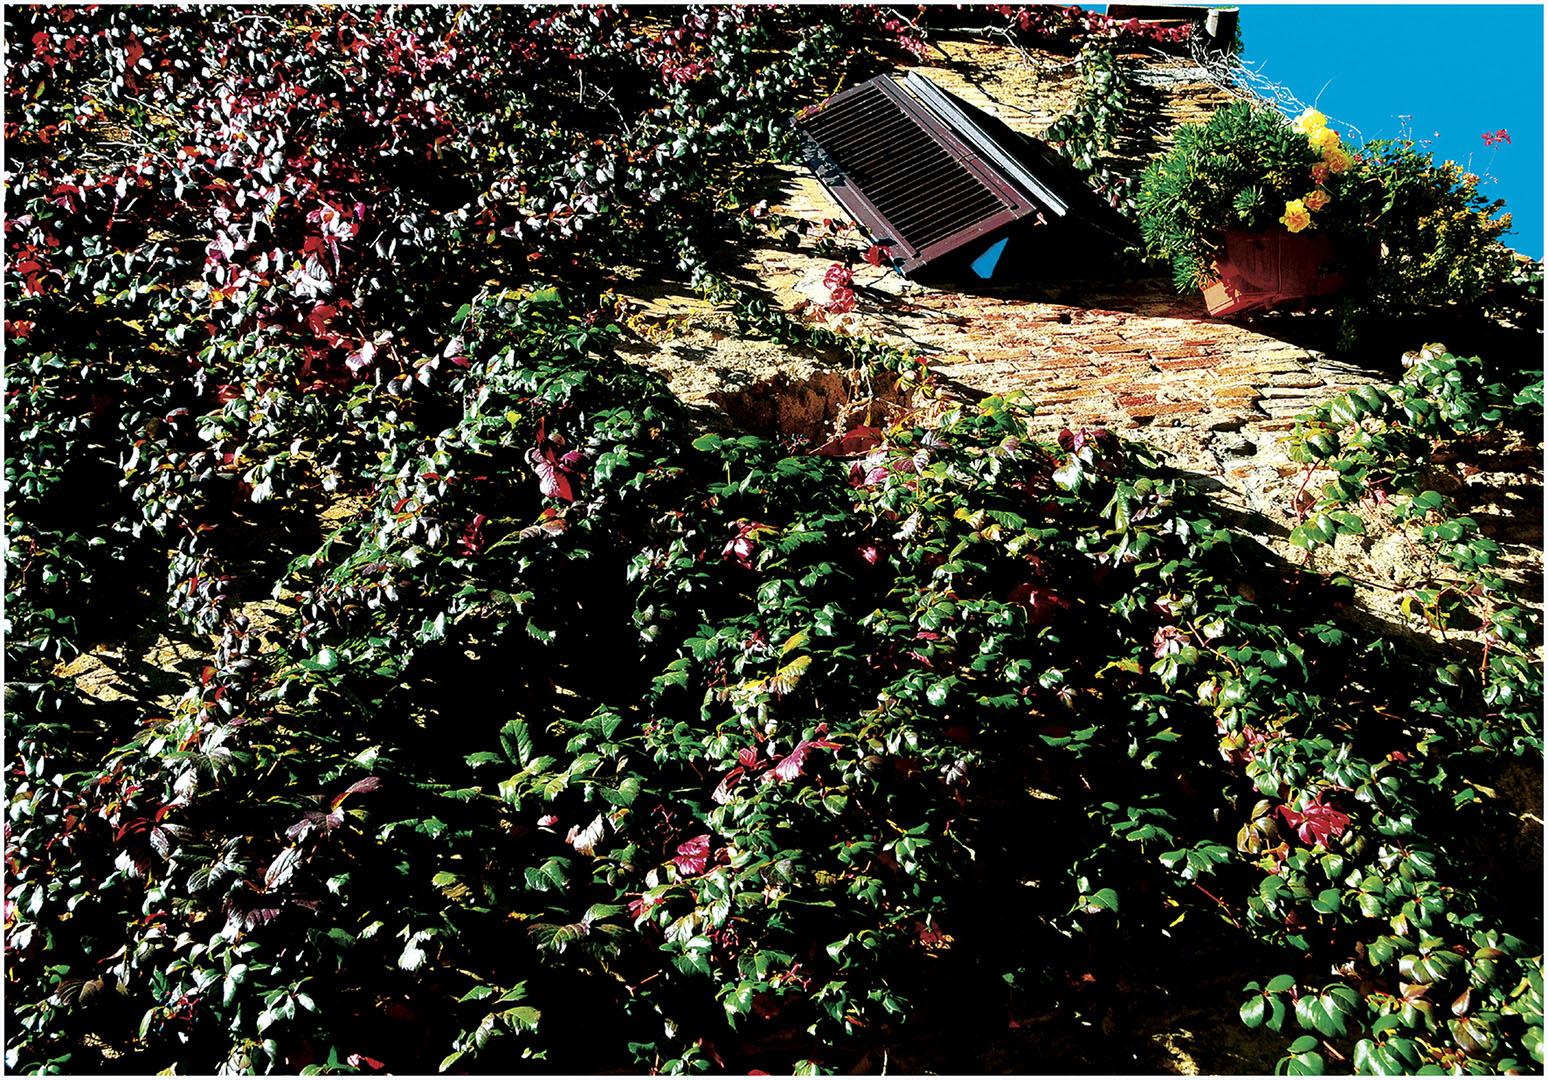 Toscana_061_I10.1-69